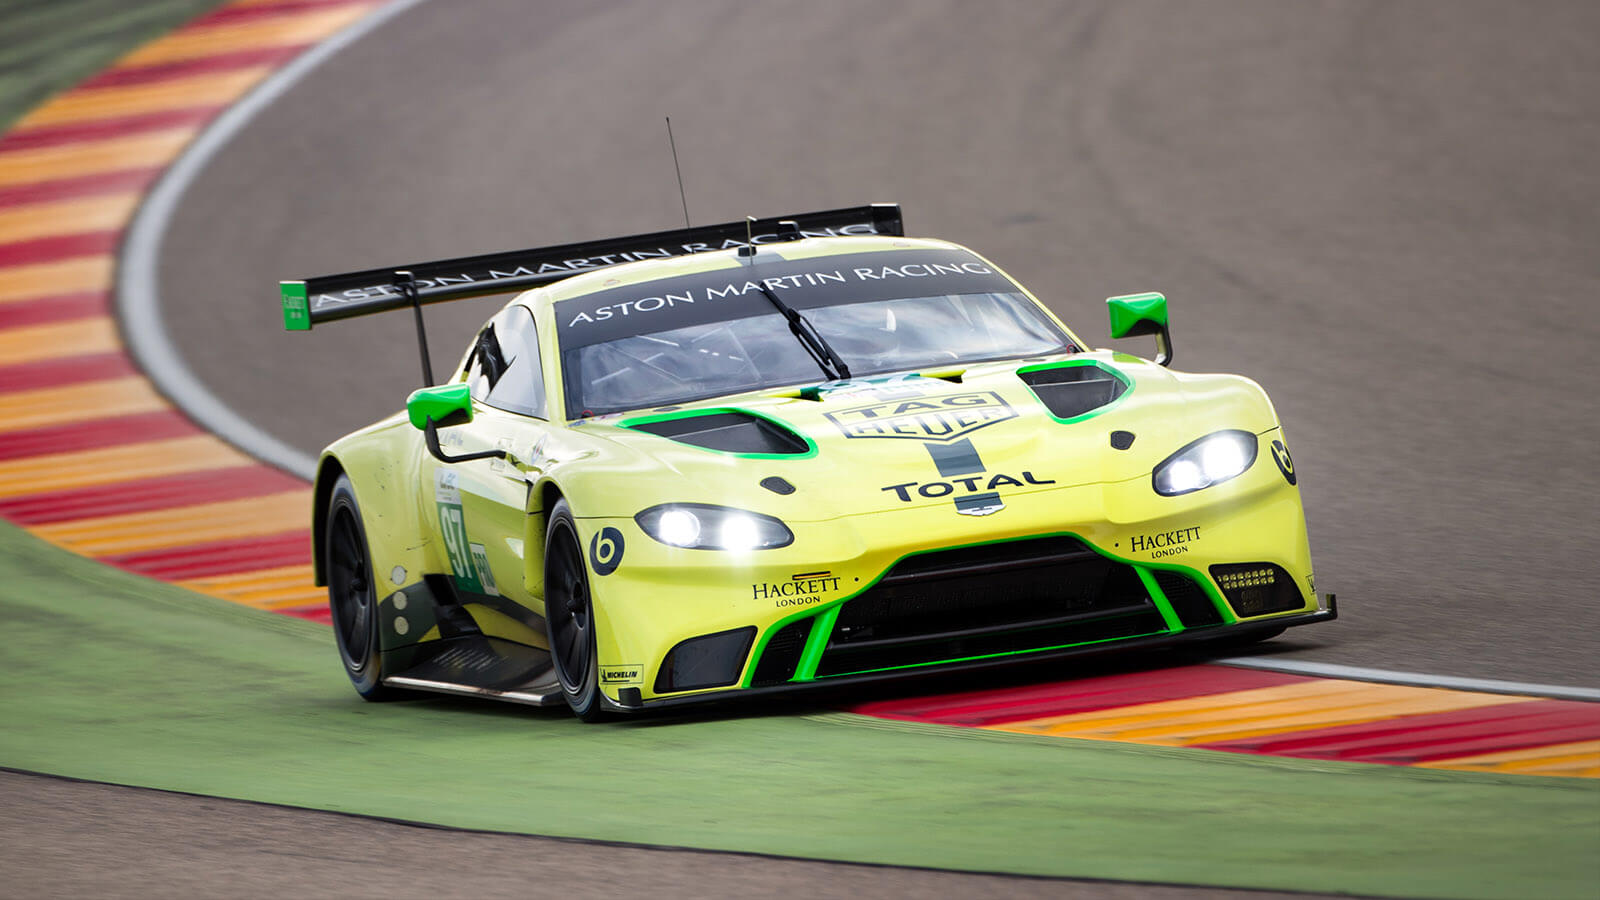 TAG HEUER Formula 1 Special Edition Aston Martin Racing_12